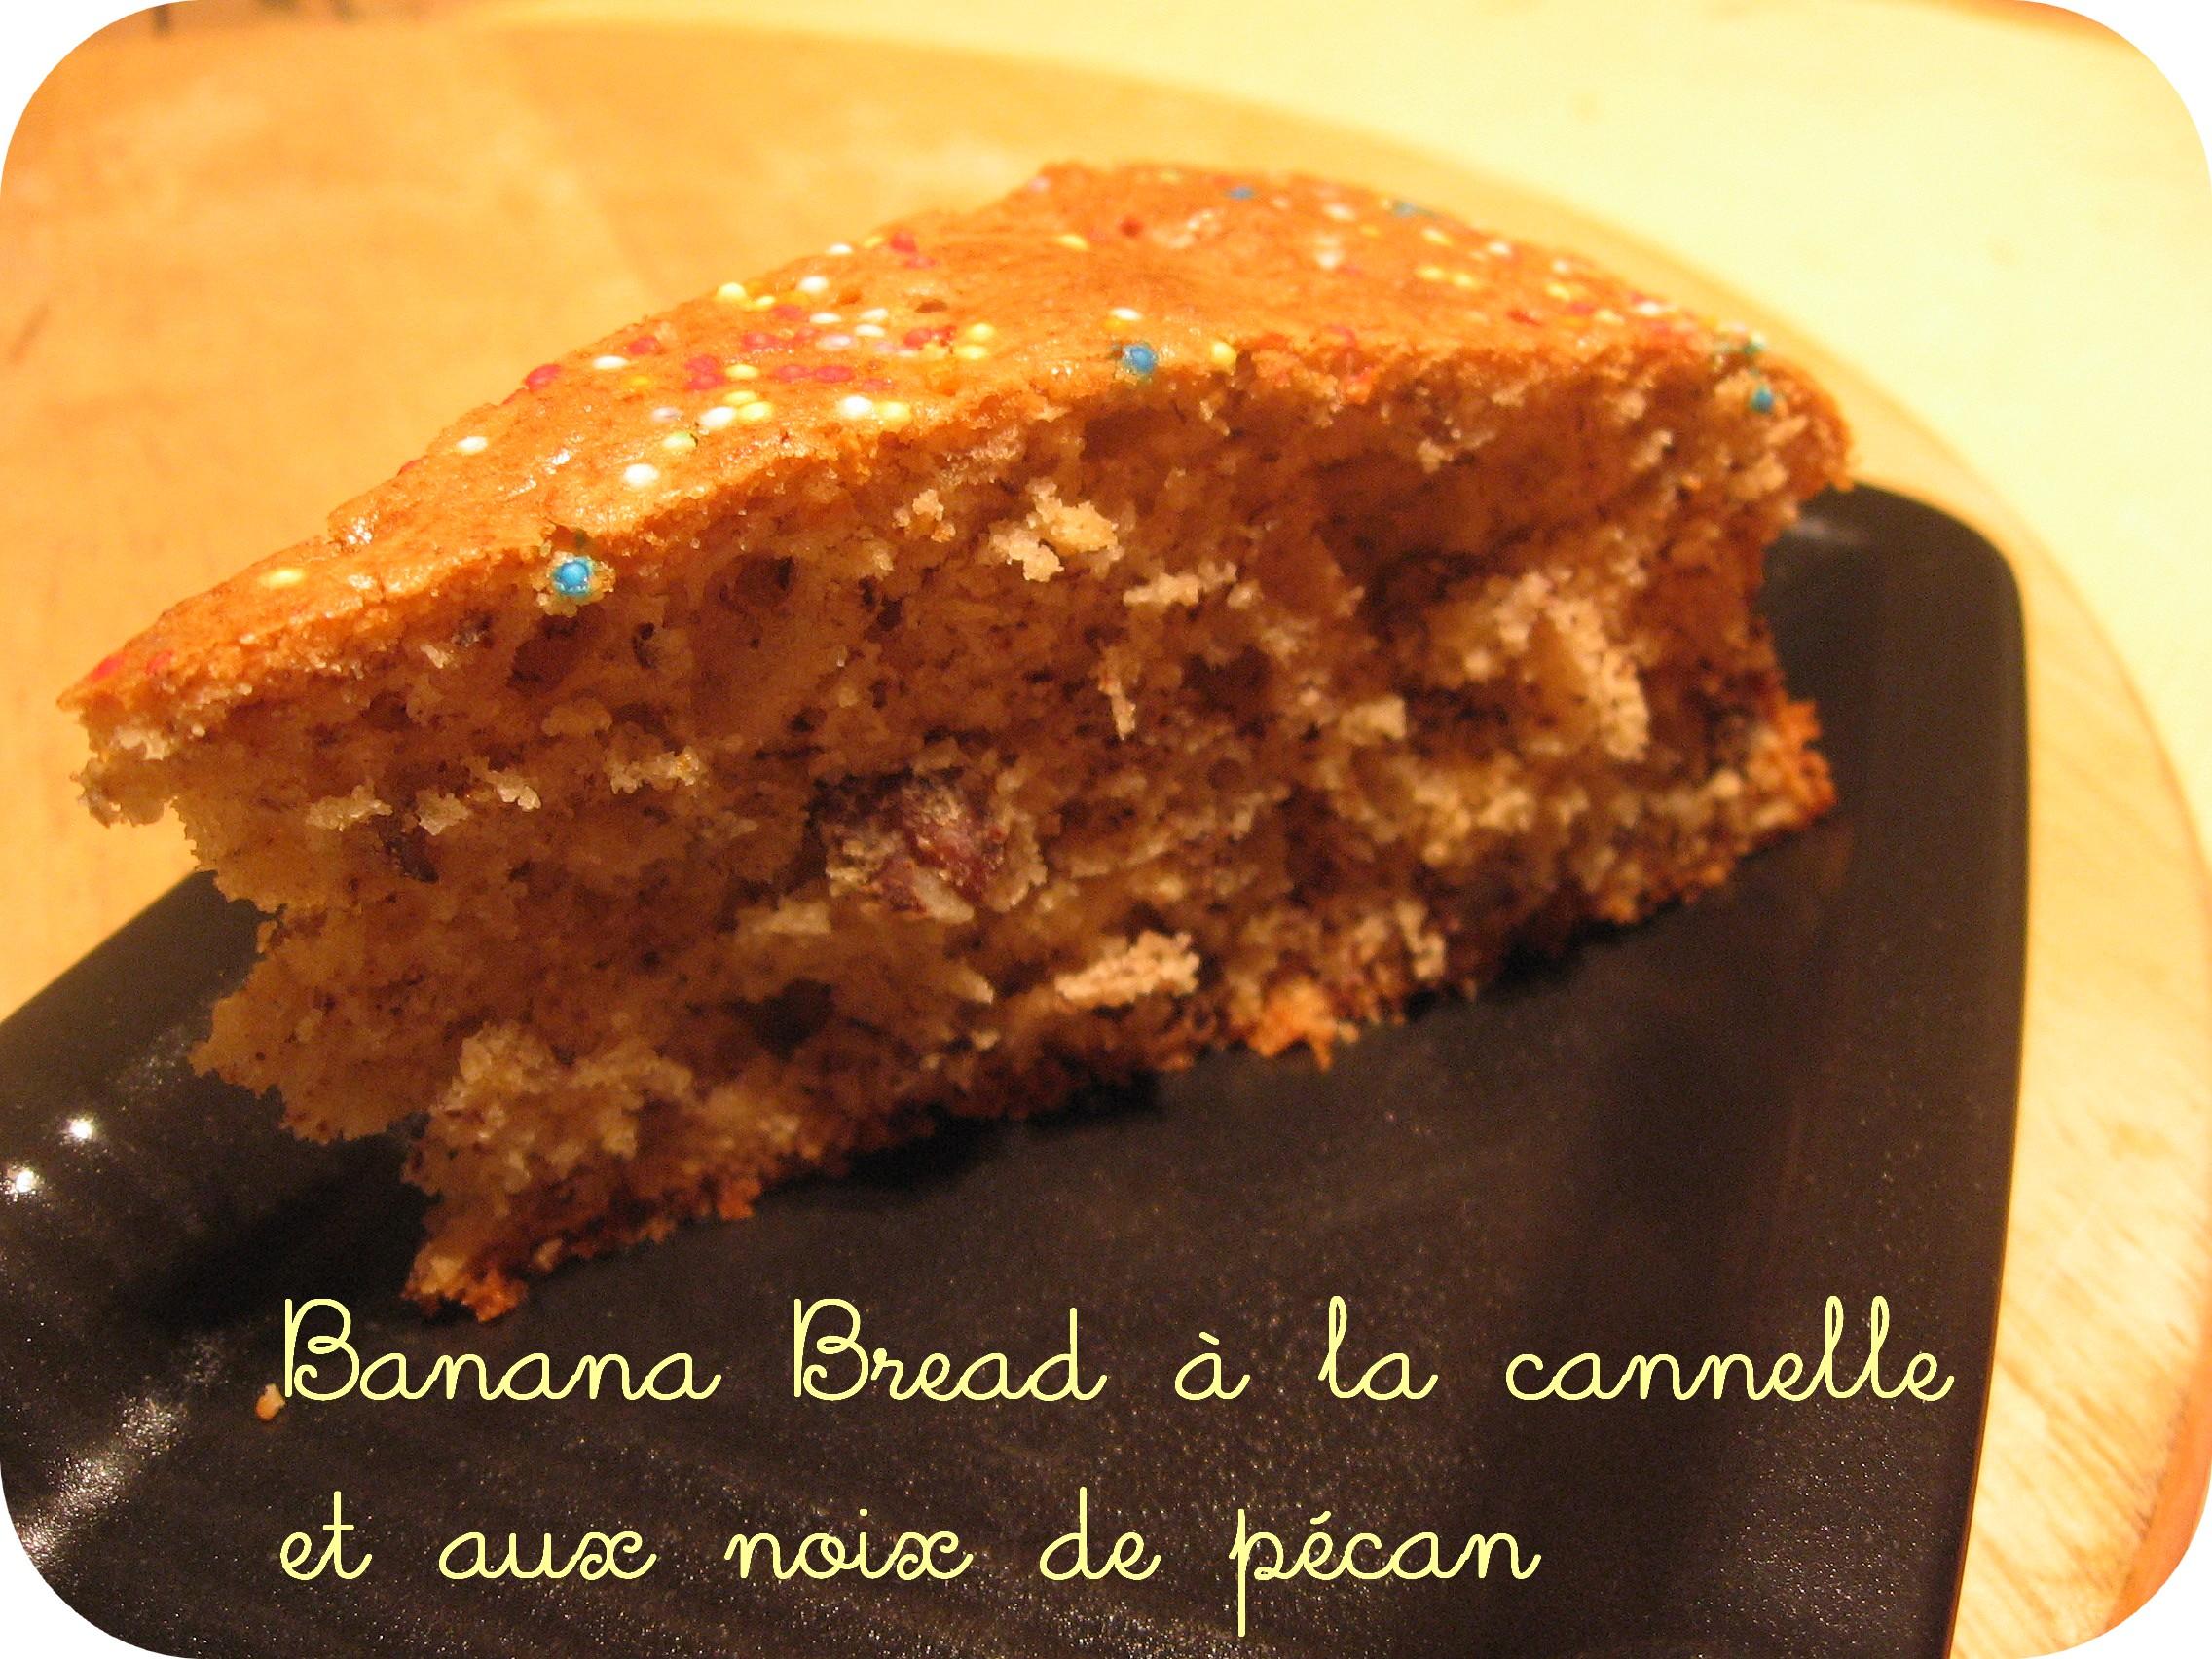 bananabread021.jpg